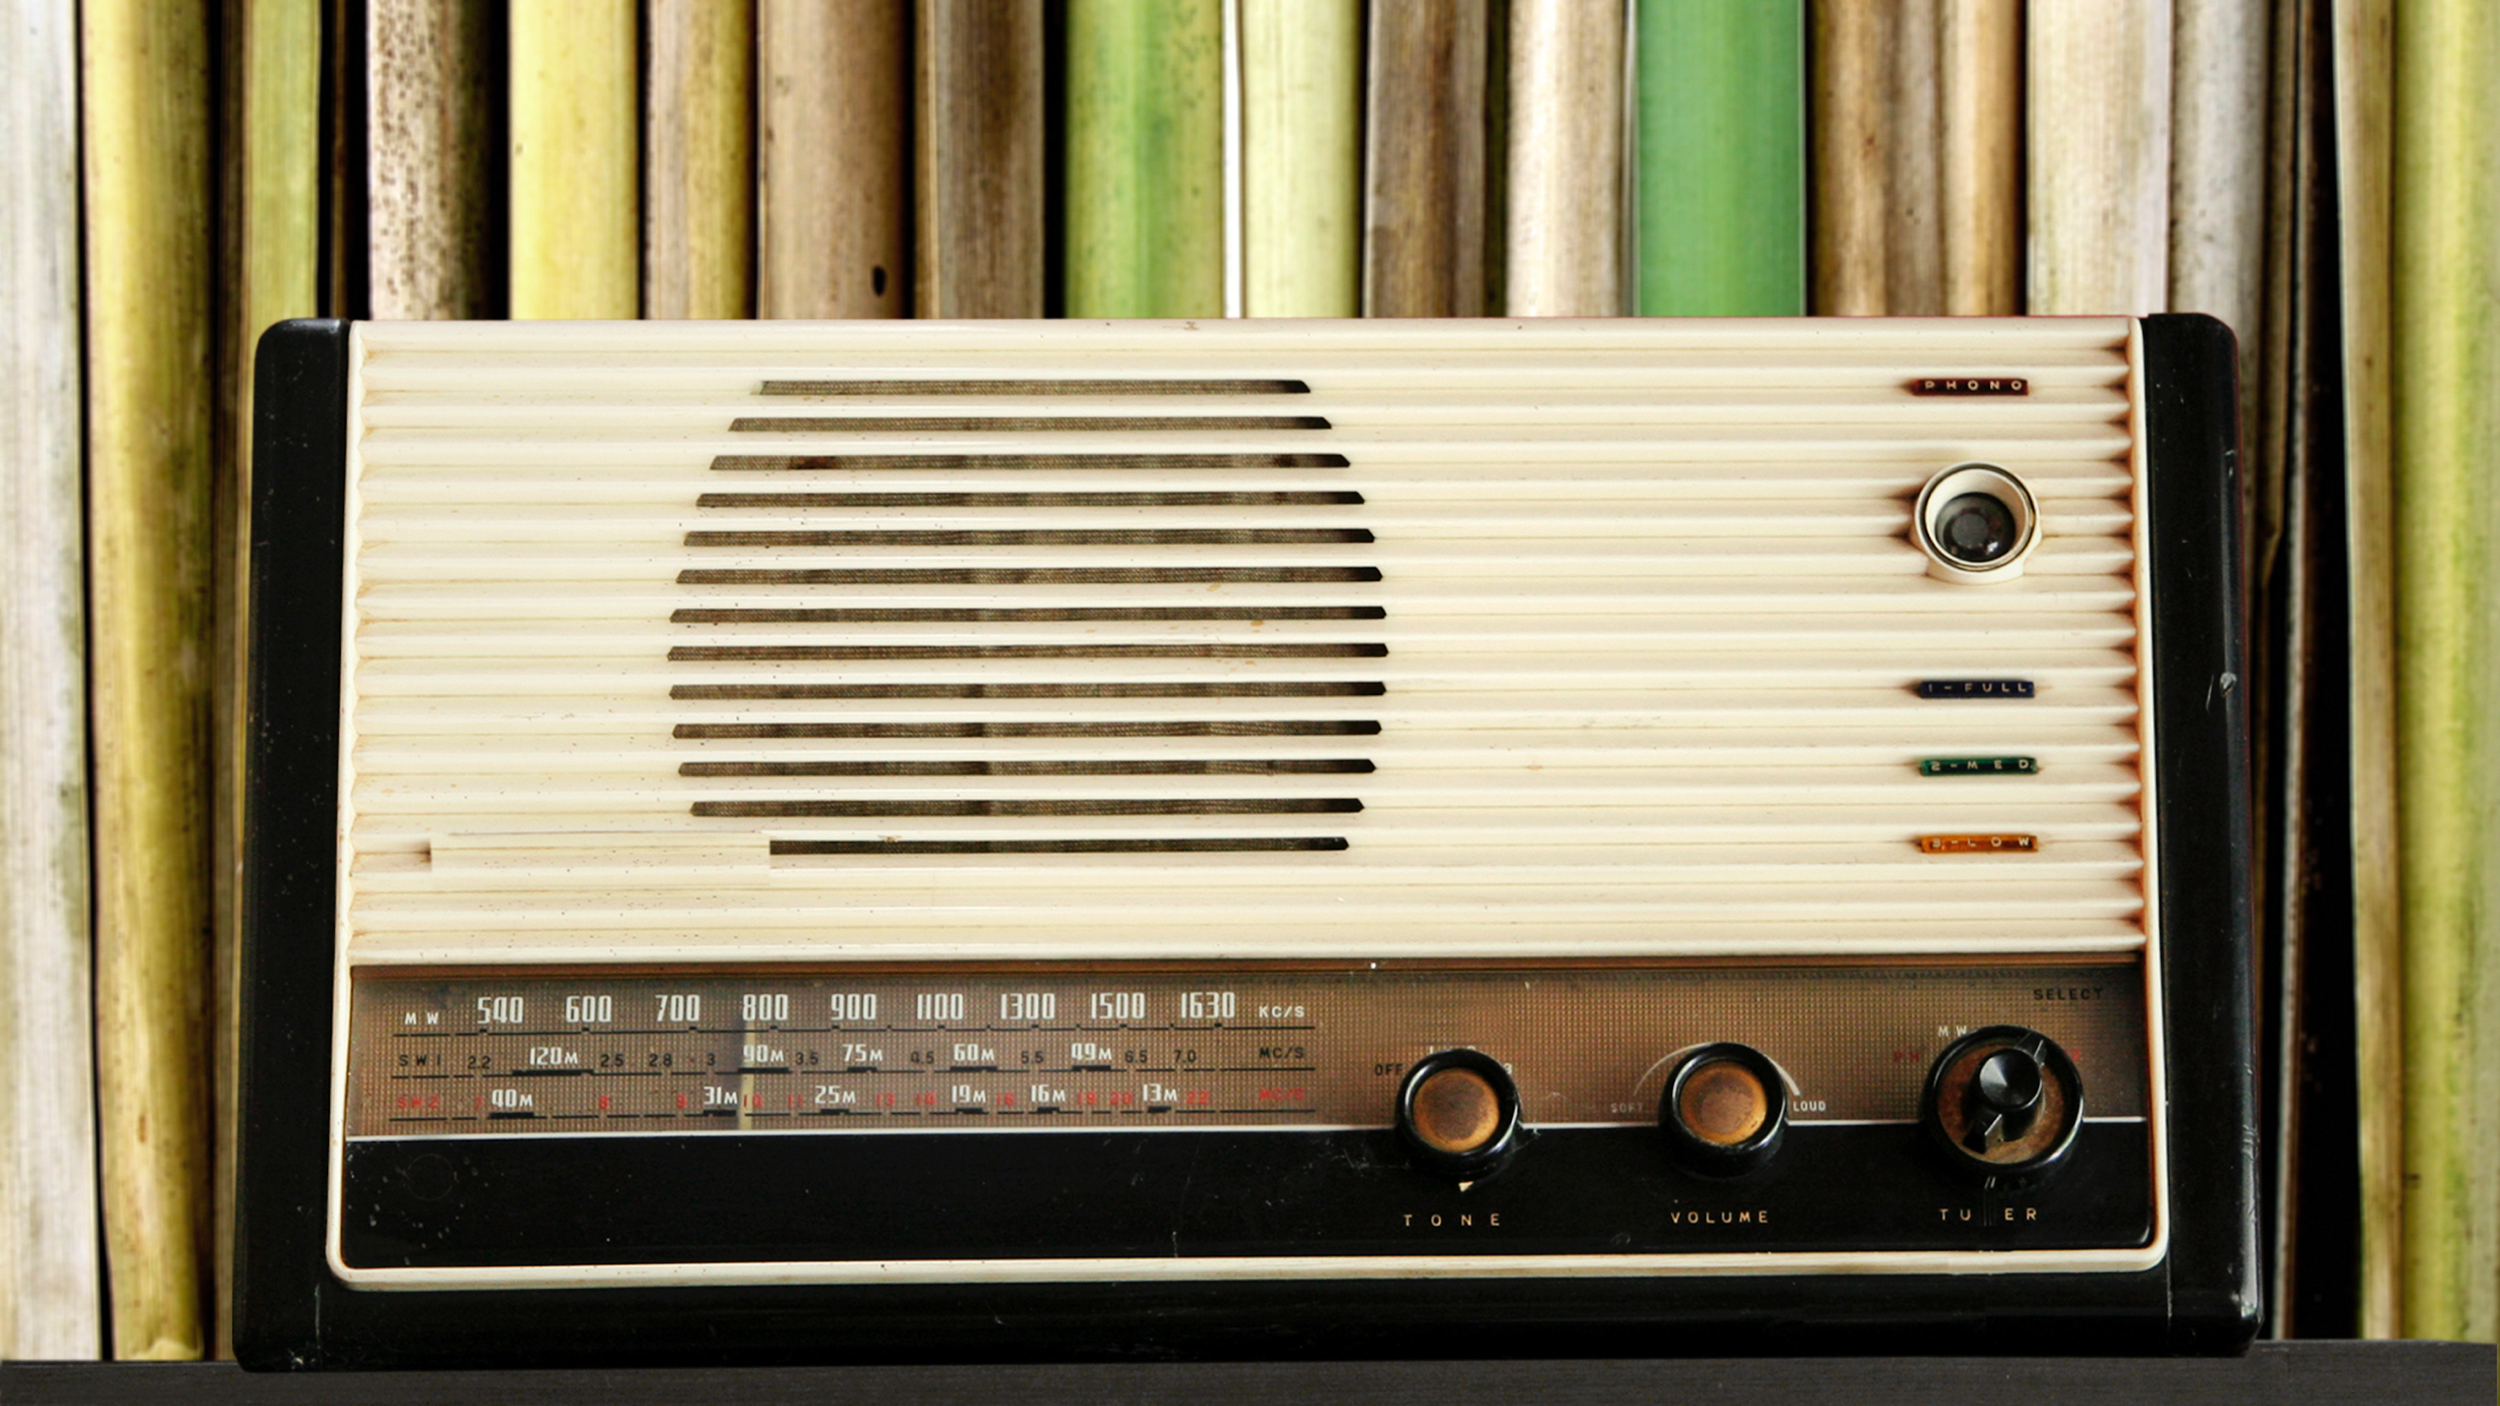 photodune-5388406-radio-m169.png